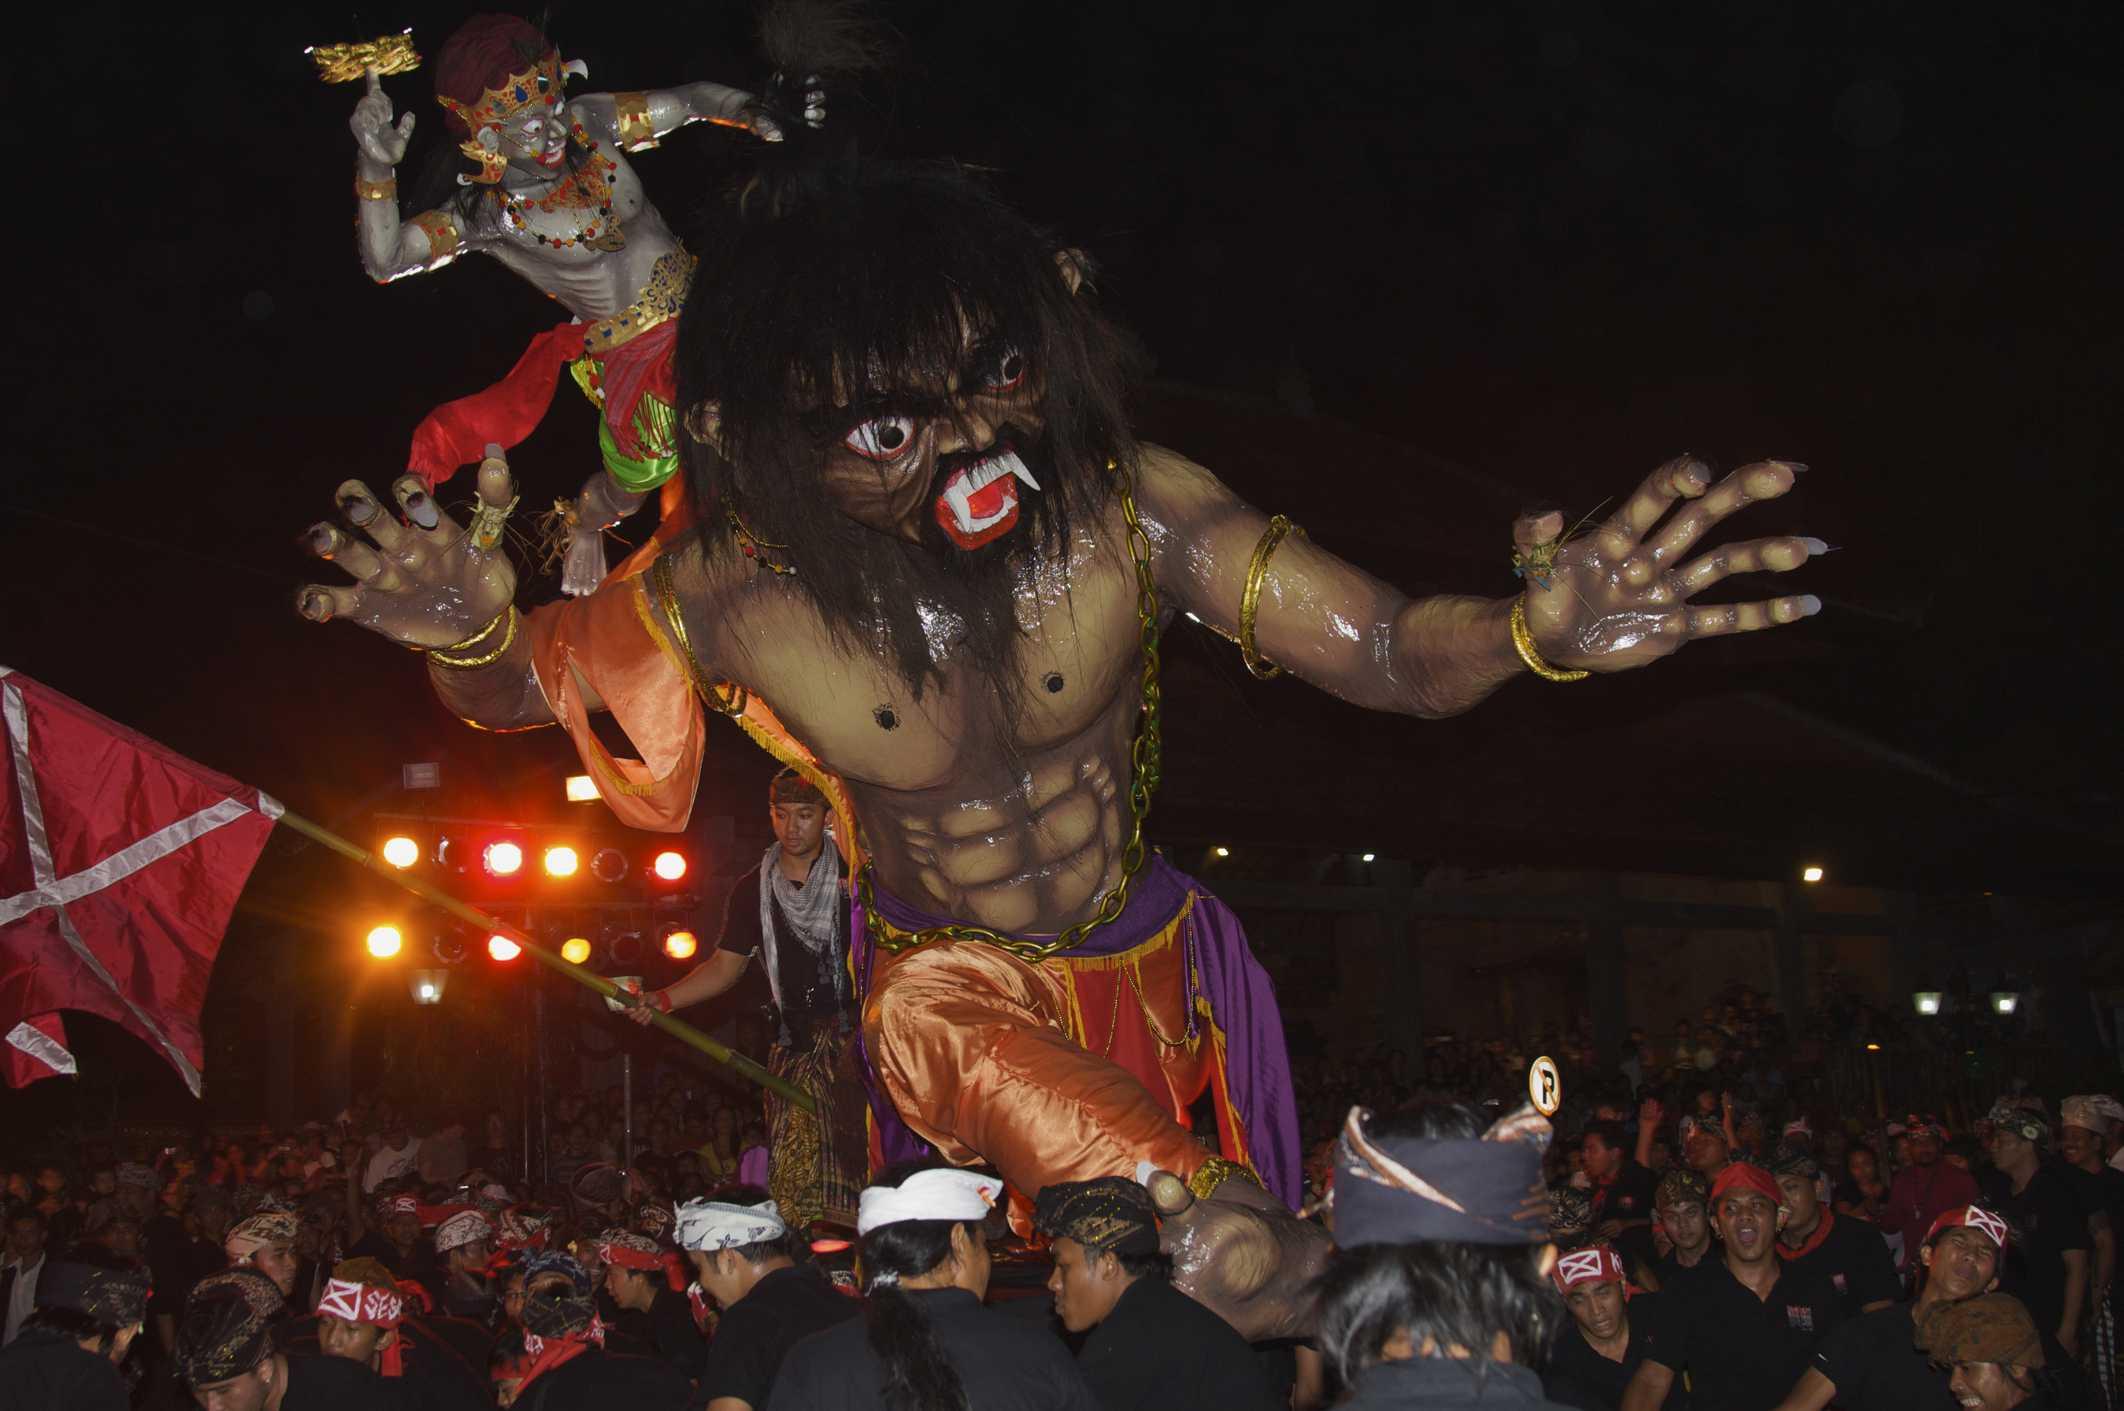 Ogoh-ogoh in parade, night before Nyepi